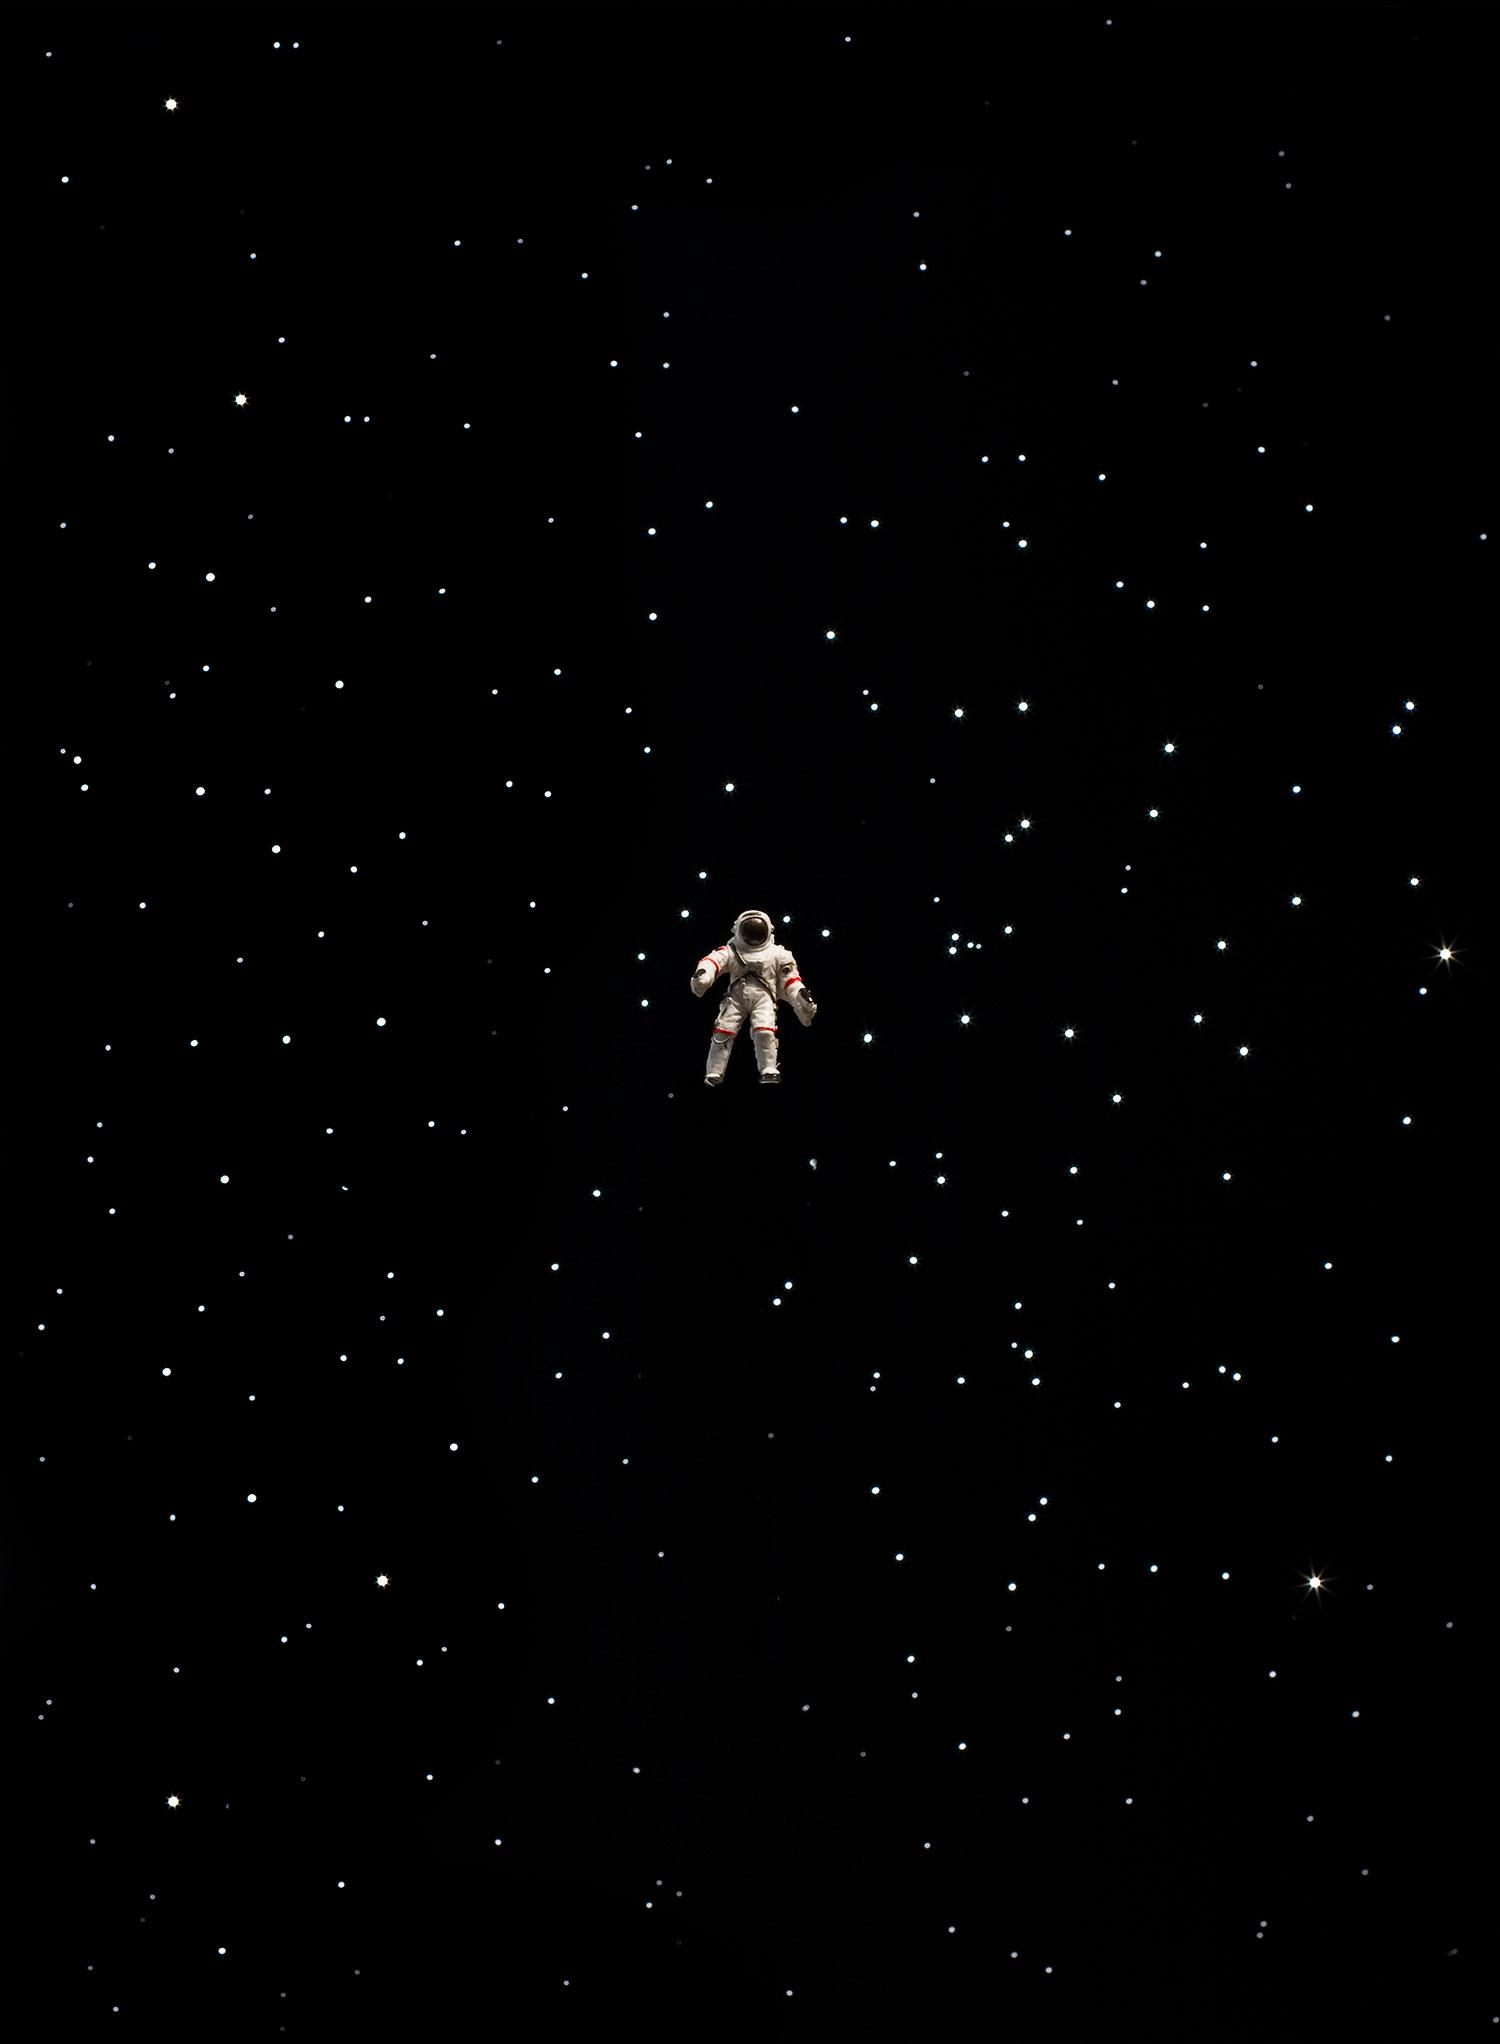 spaceman_forweb.jpg